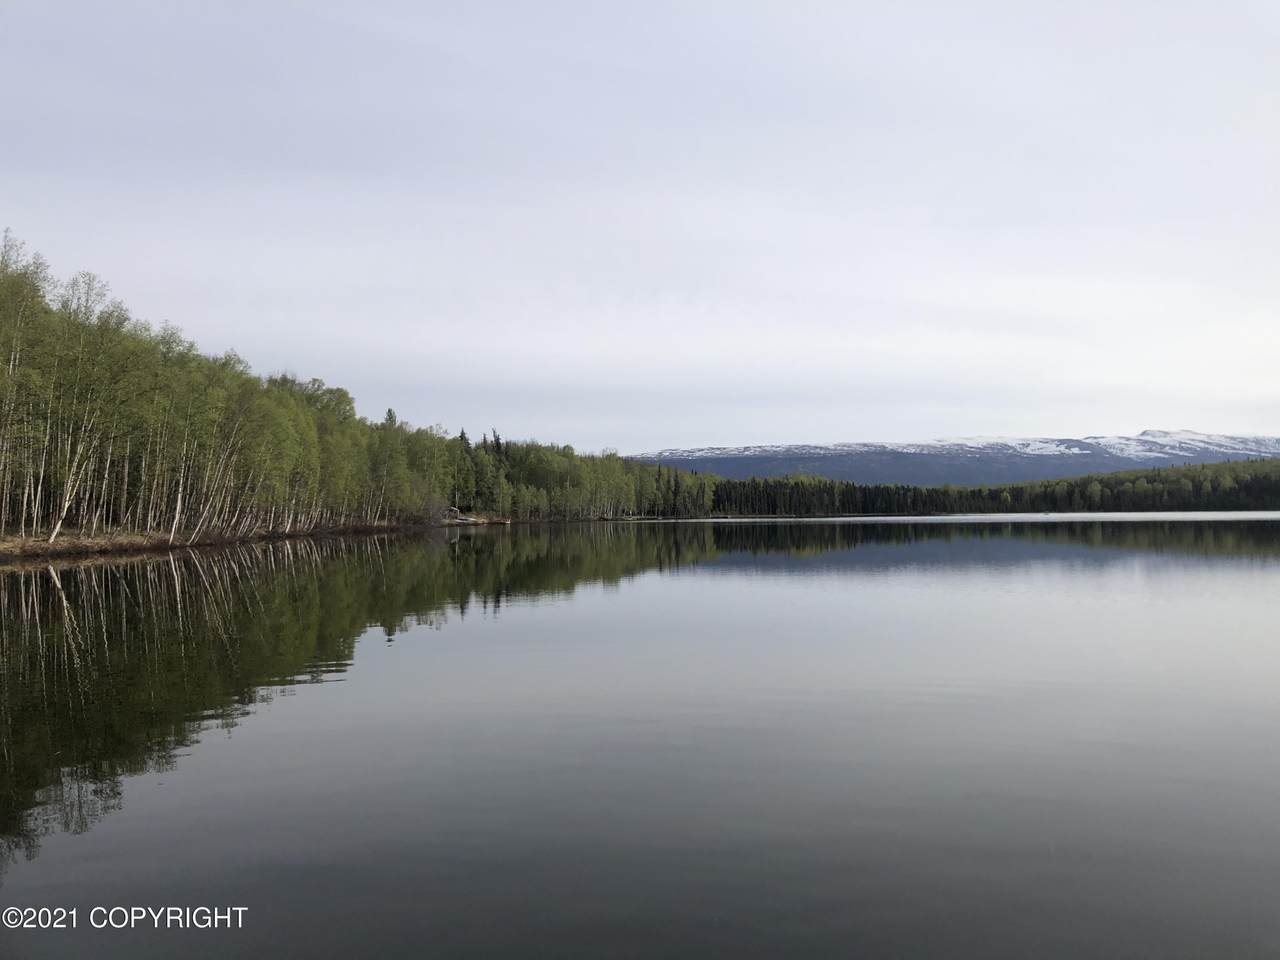 https://bt-photos.global.ssl.fastly.net/alaska/1280_boomver_3_21-6354-2.jpg